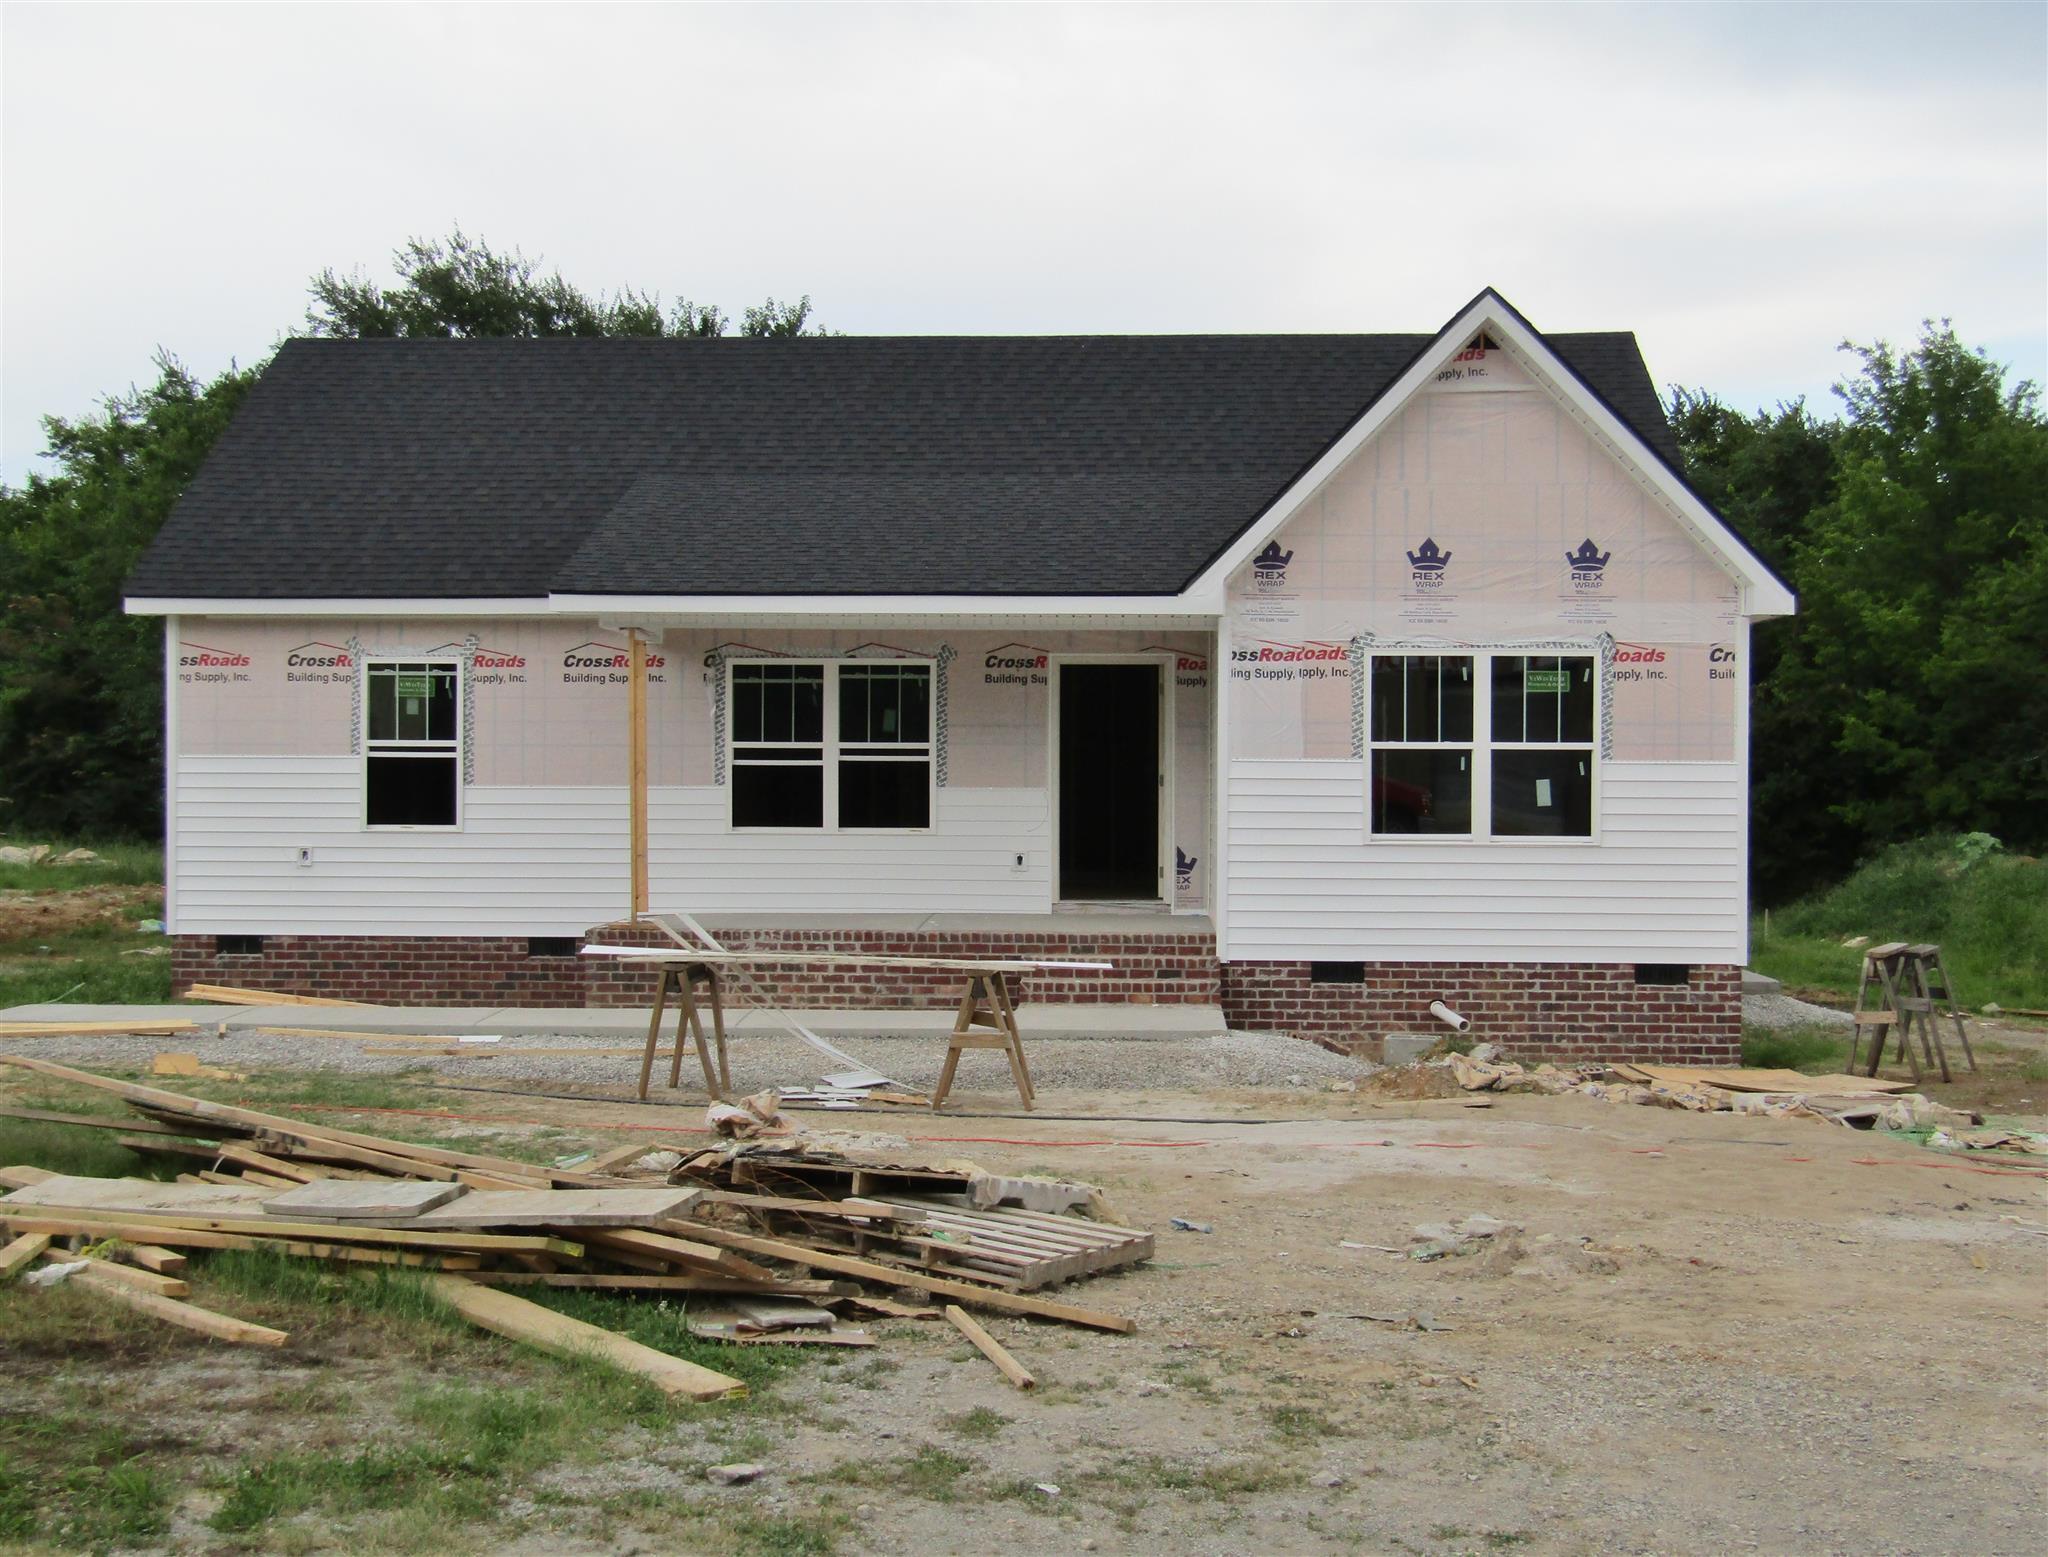 173 Freeman Dr, Lewisburg, TN 37091 - Lewisburg, TN real estate listing